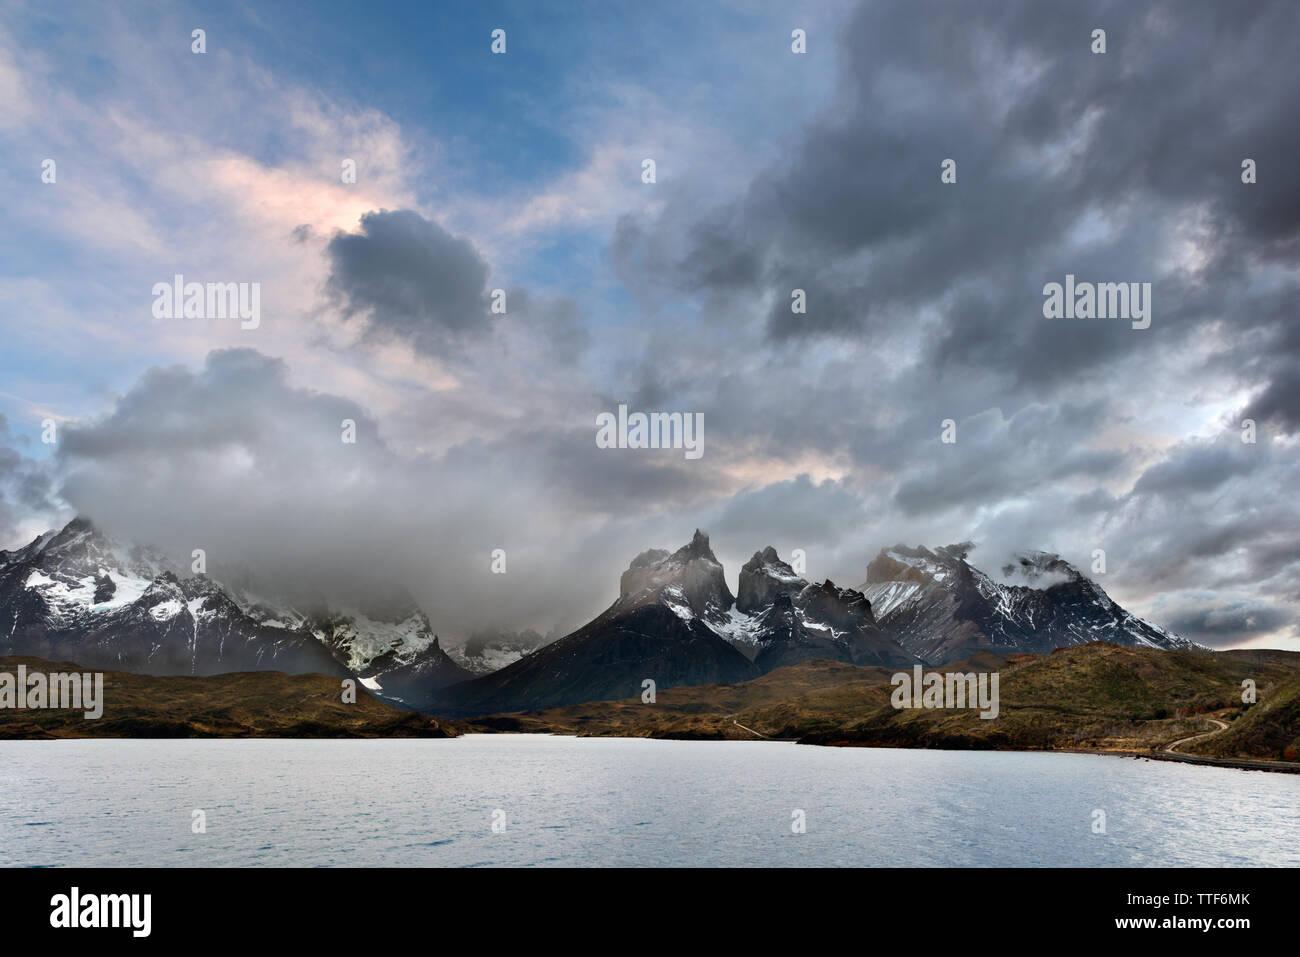 Mountain landscape, Torres del Paine NP, Chile - Stock Image